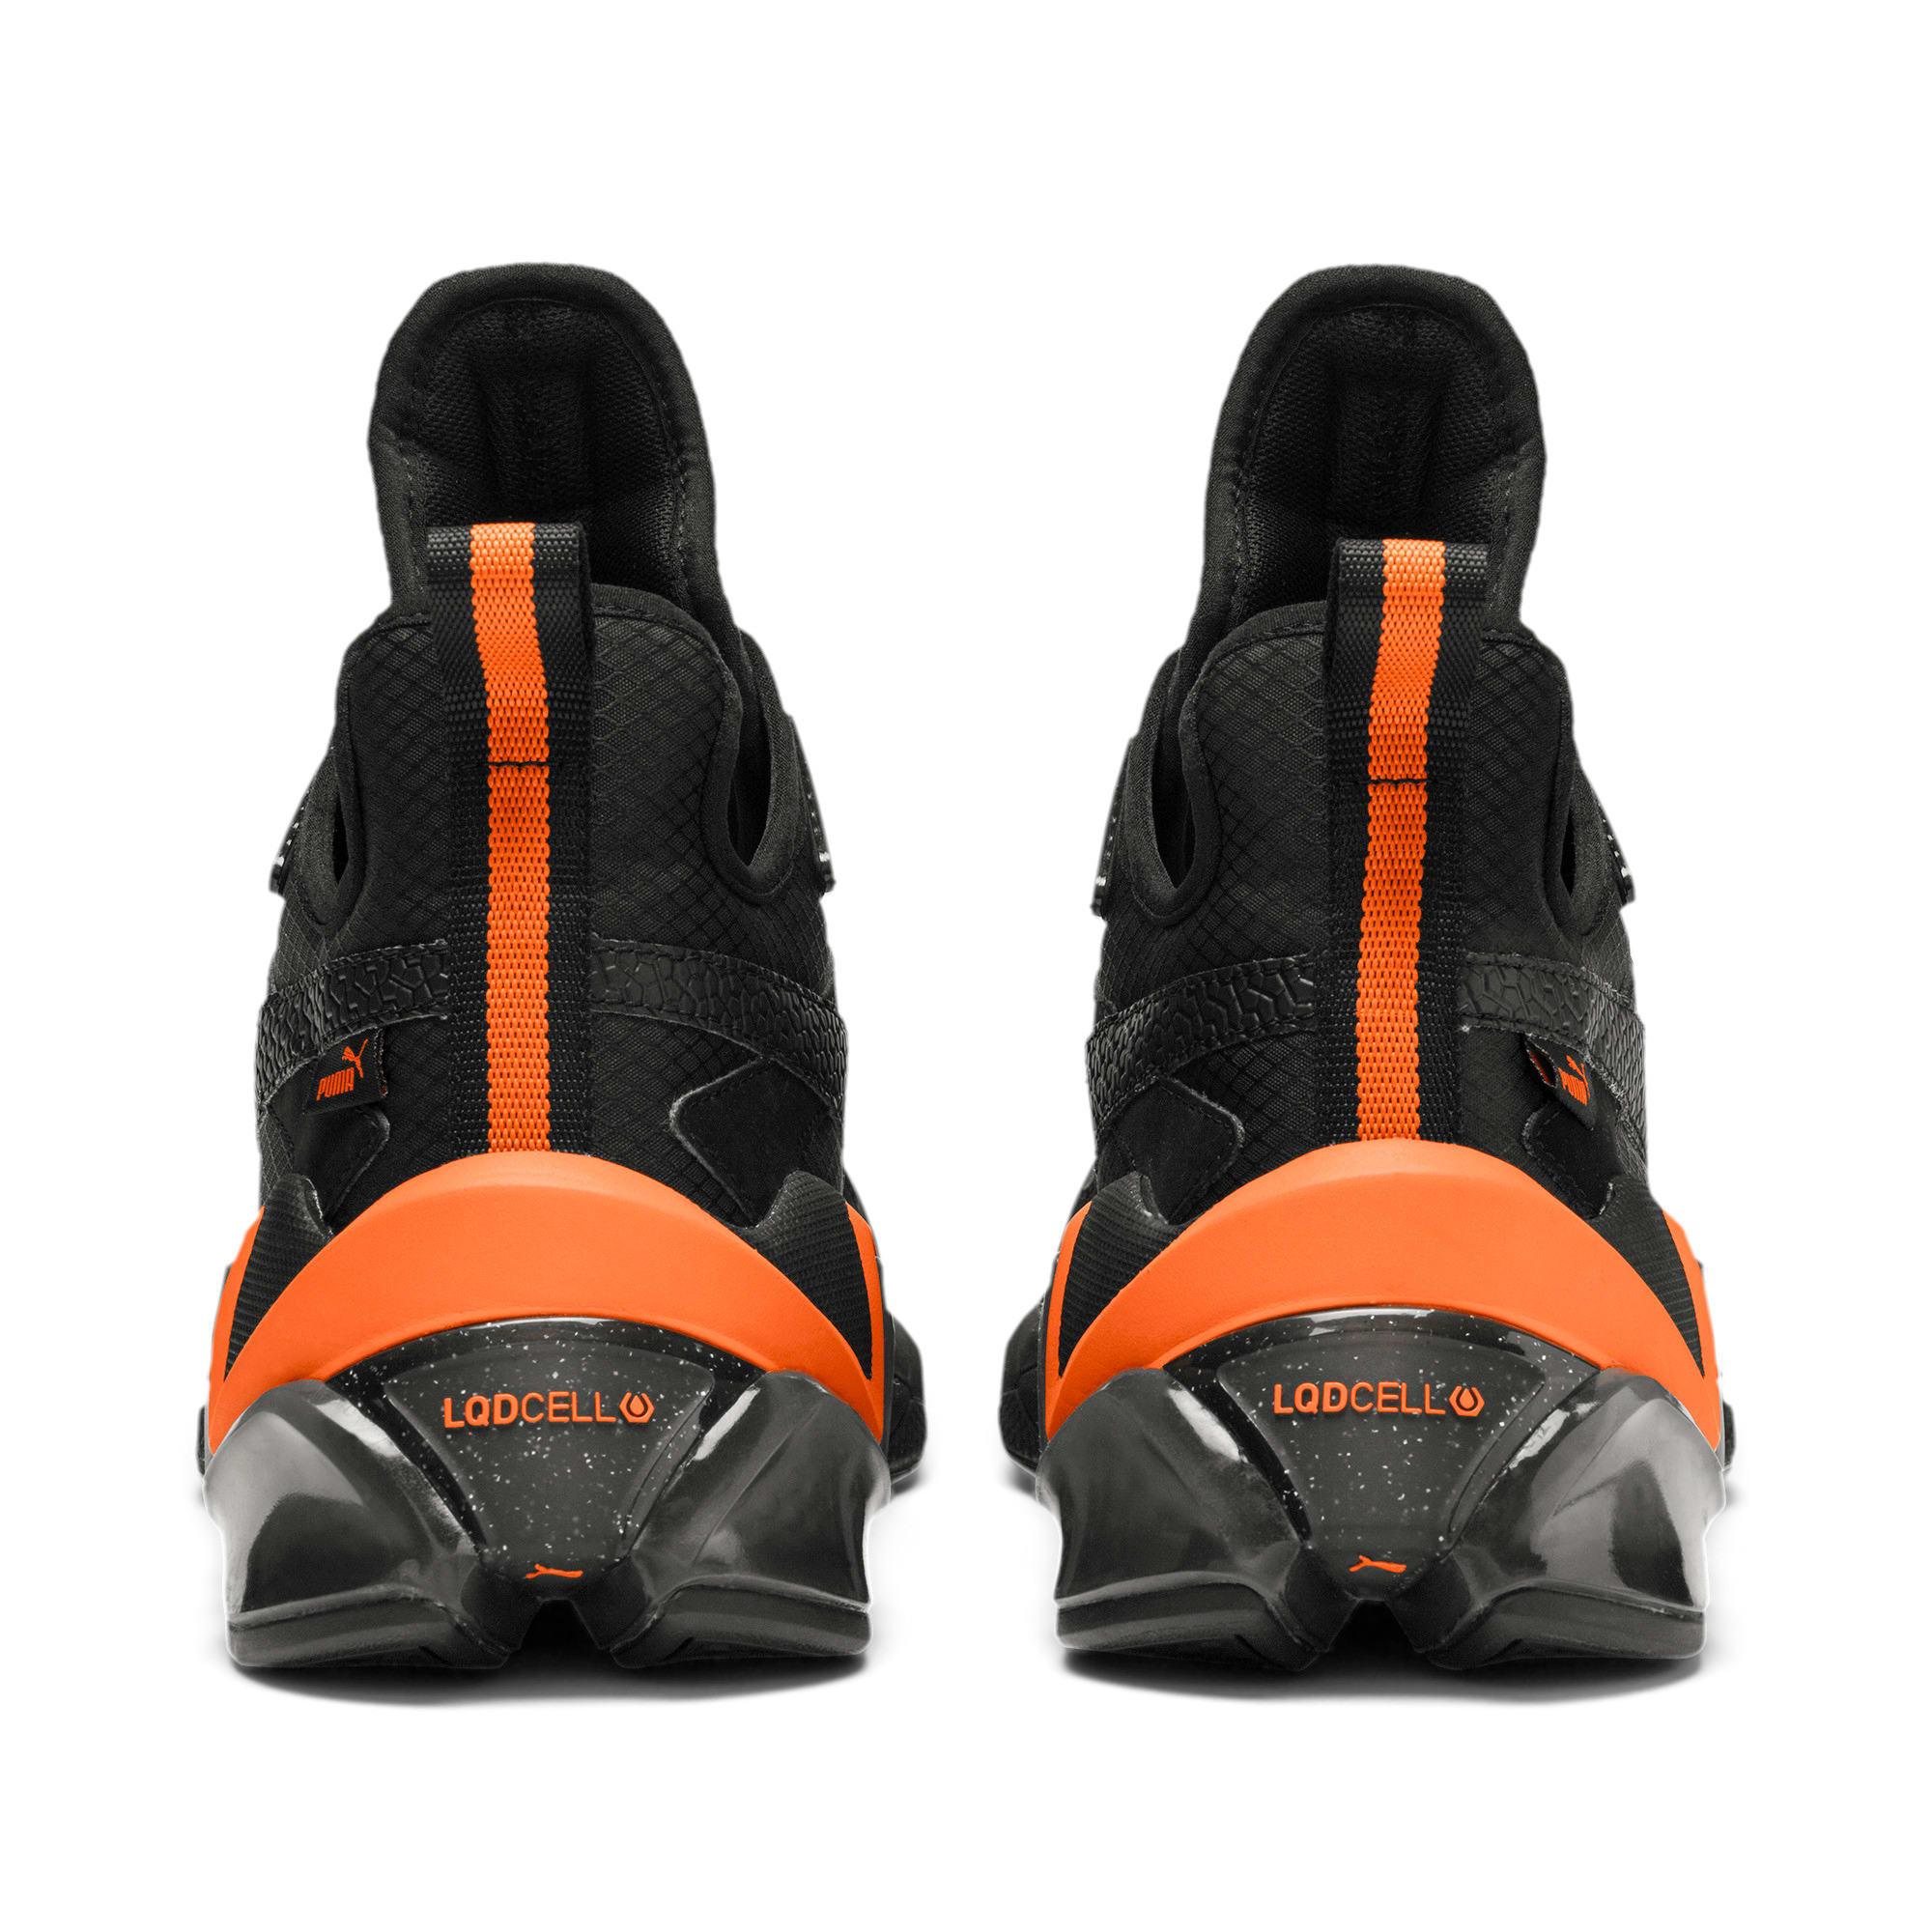 Thumbnail 4 of LQDCELL Origin Terrain Men's Training Shoes, Puma Black-Jaffa Orange, medium